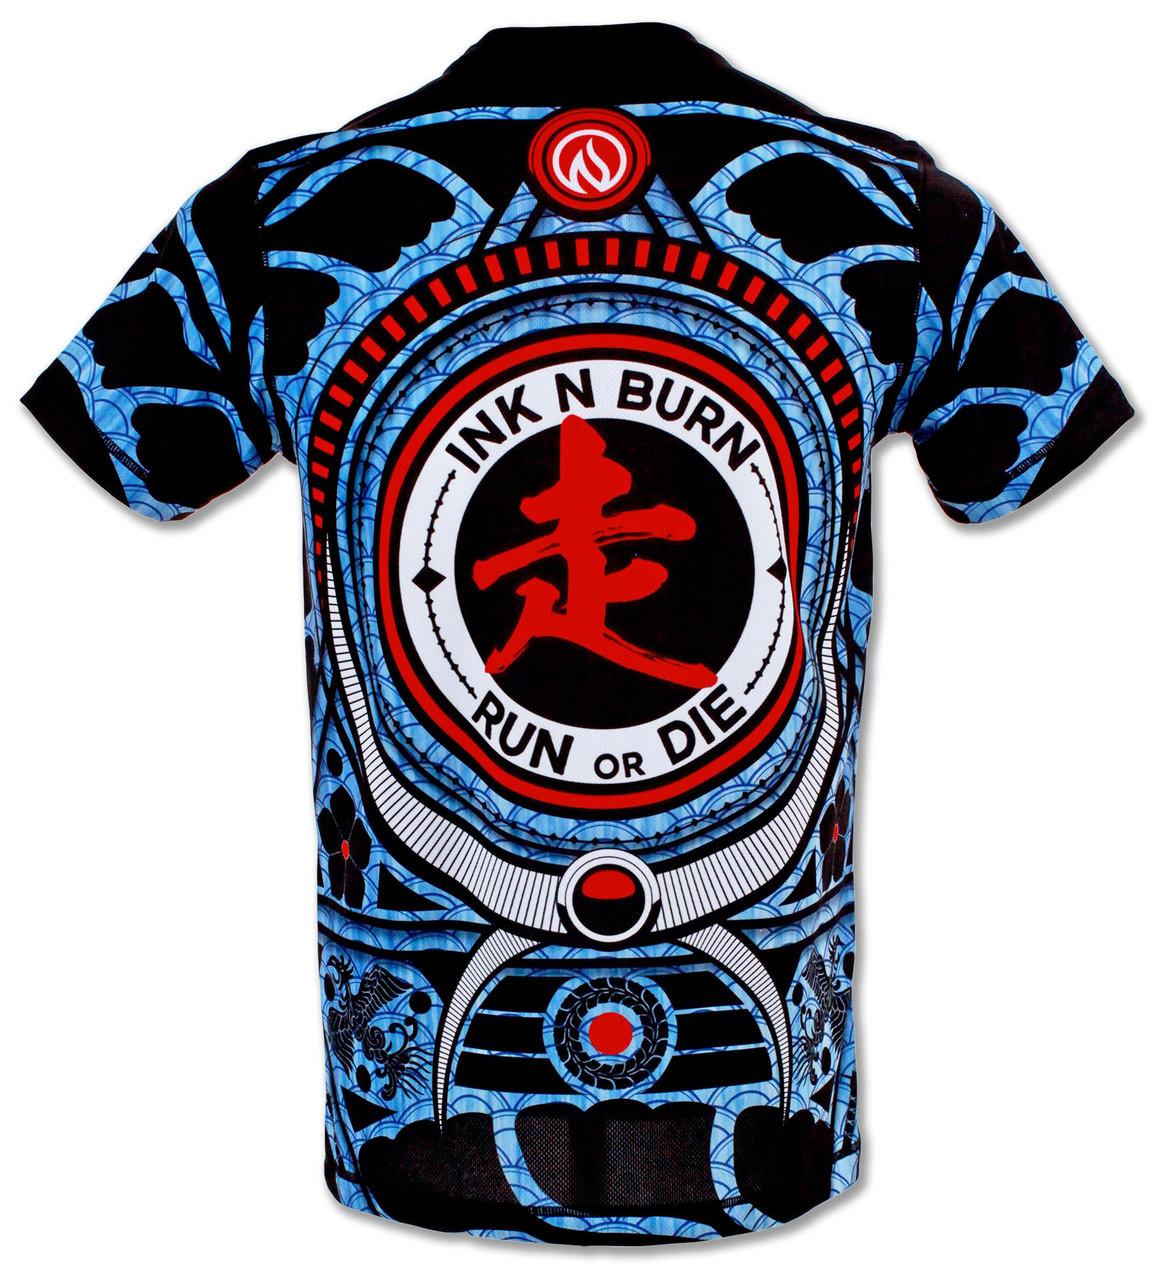 INKnBURN Men's Warrior Run or Die Tech Shirt Back